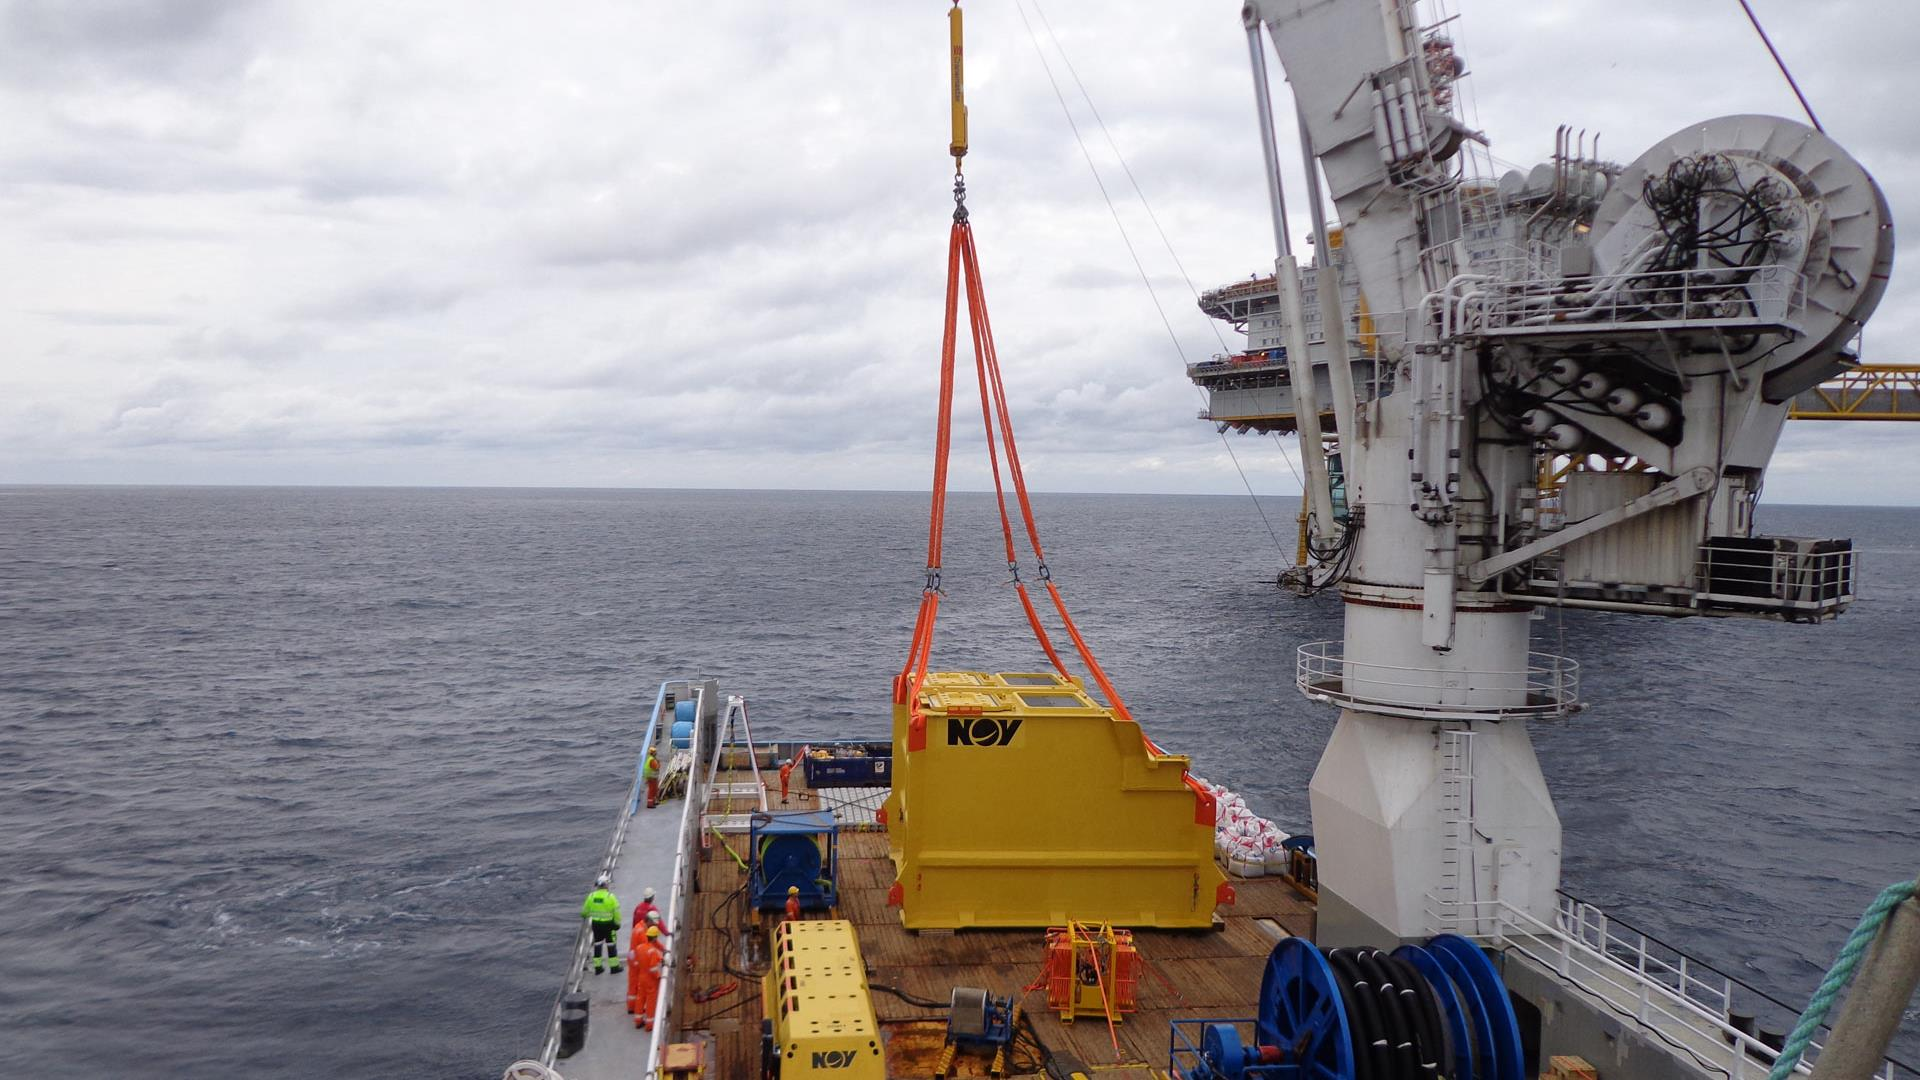 Seabox module on offshore platform preparing for installation subsea